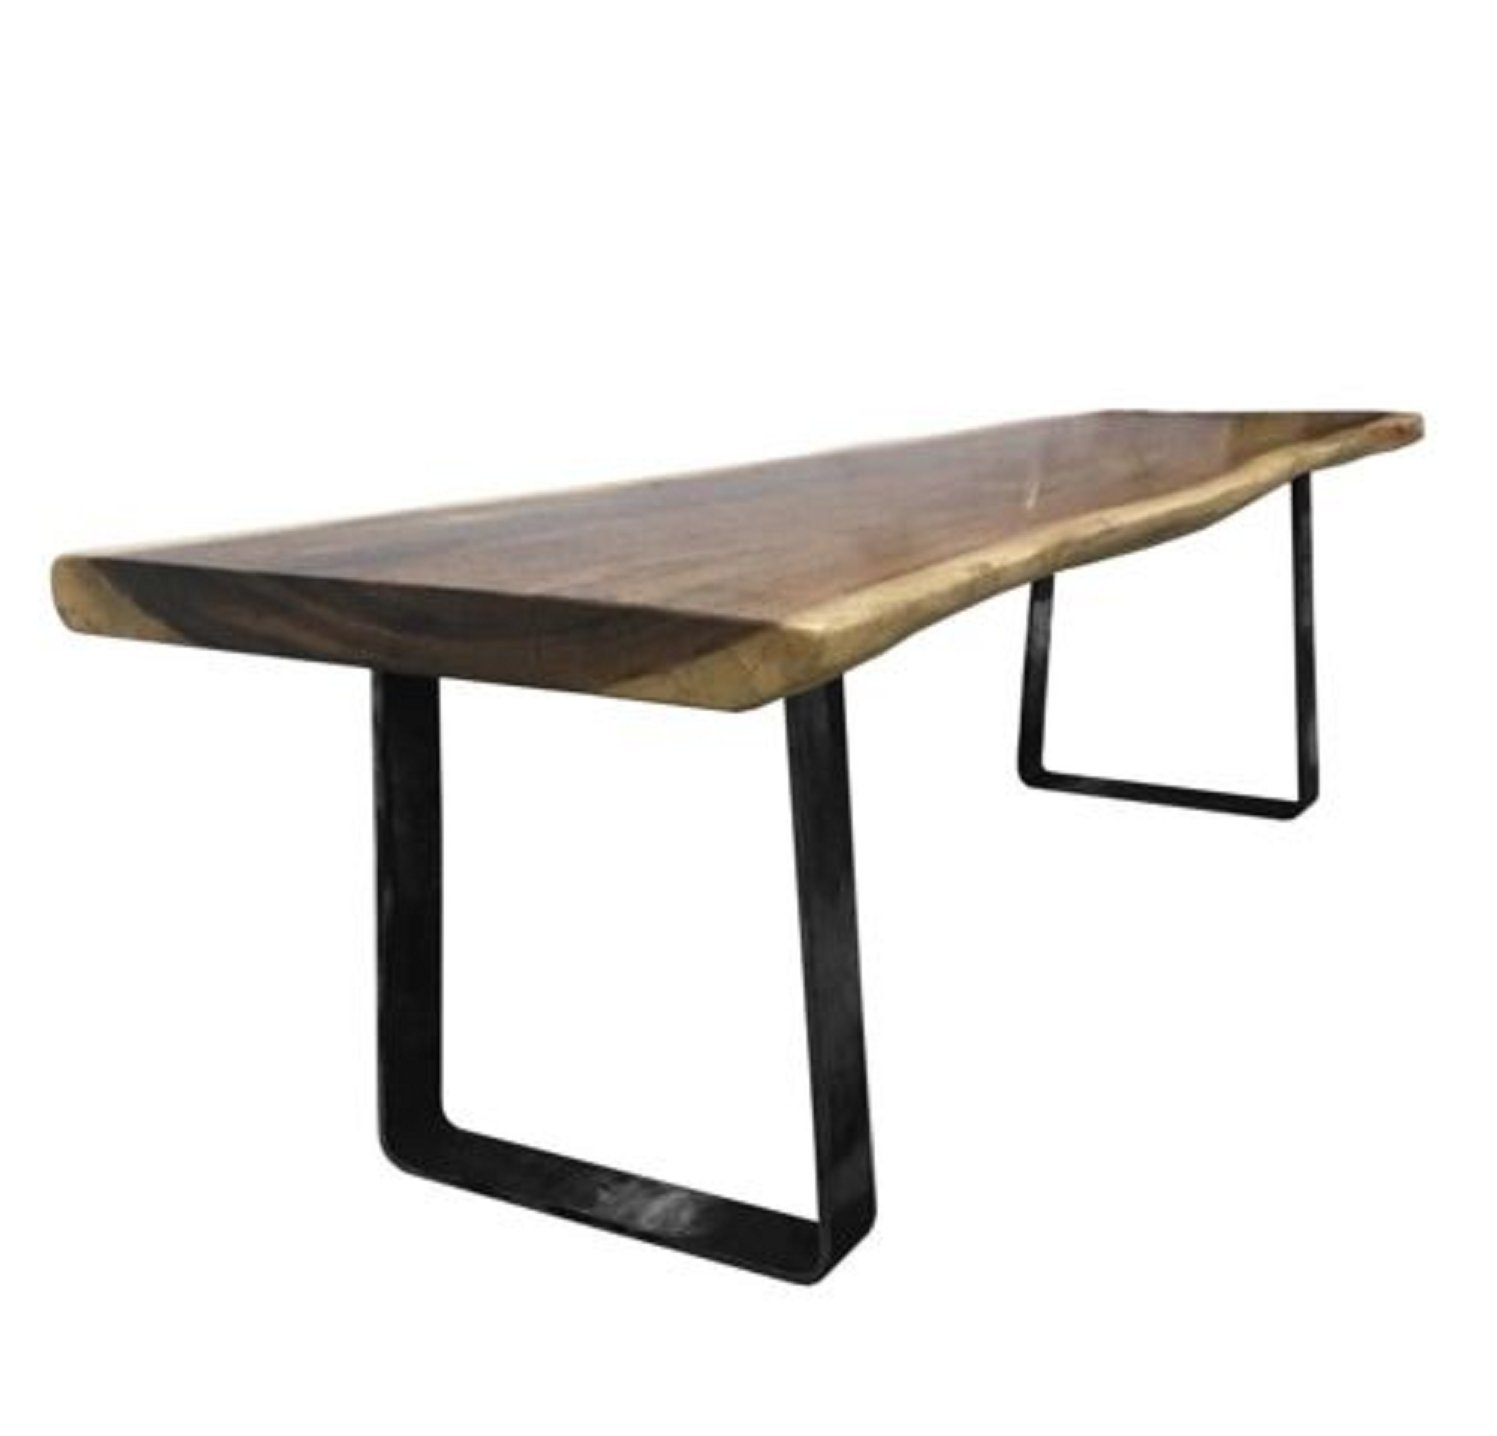 USA Premium Store 16'' Industrial Metal Coffee Table Legs Trapezoid Heavy Duty DIY Furniture